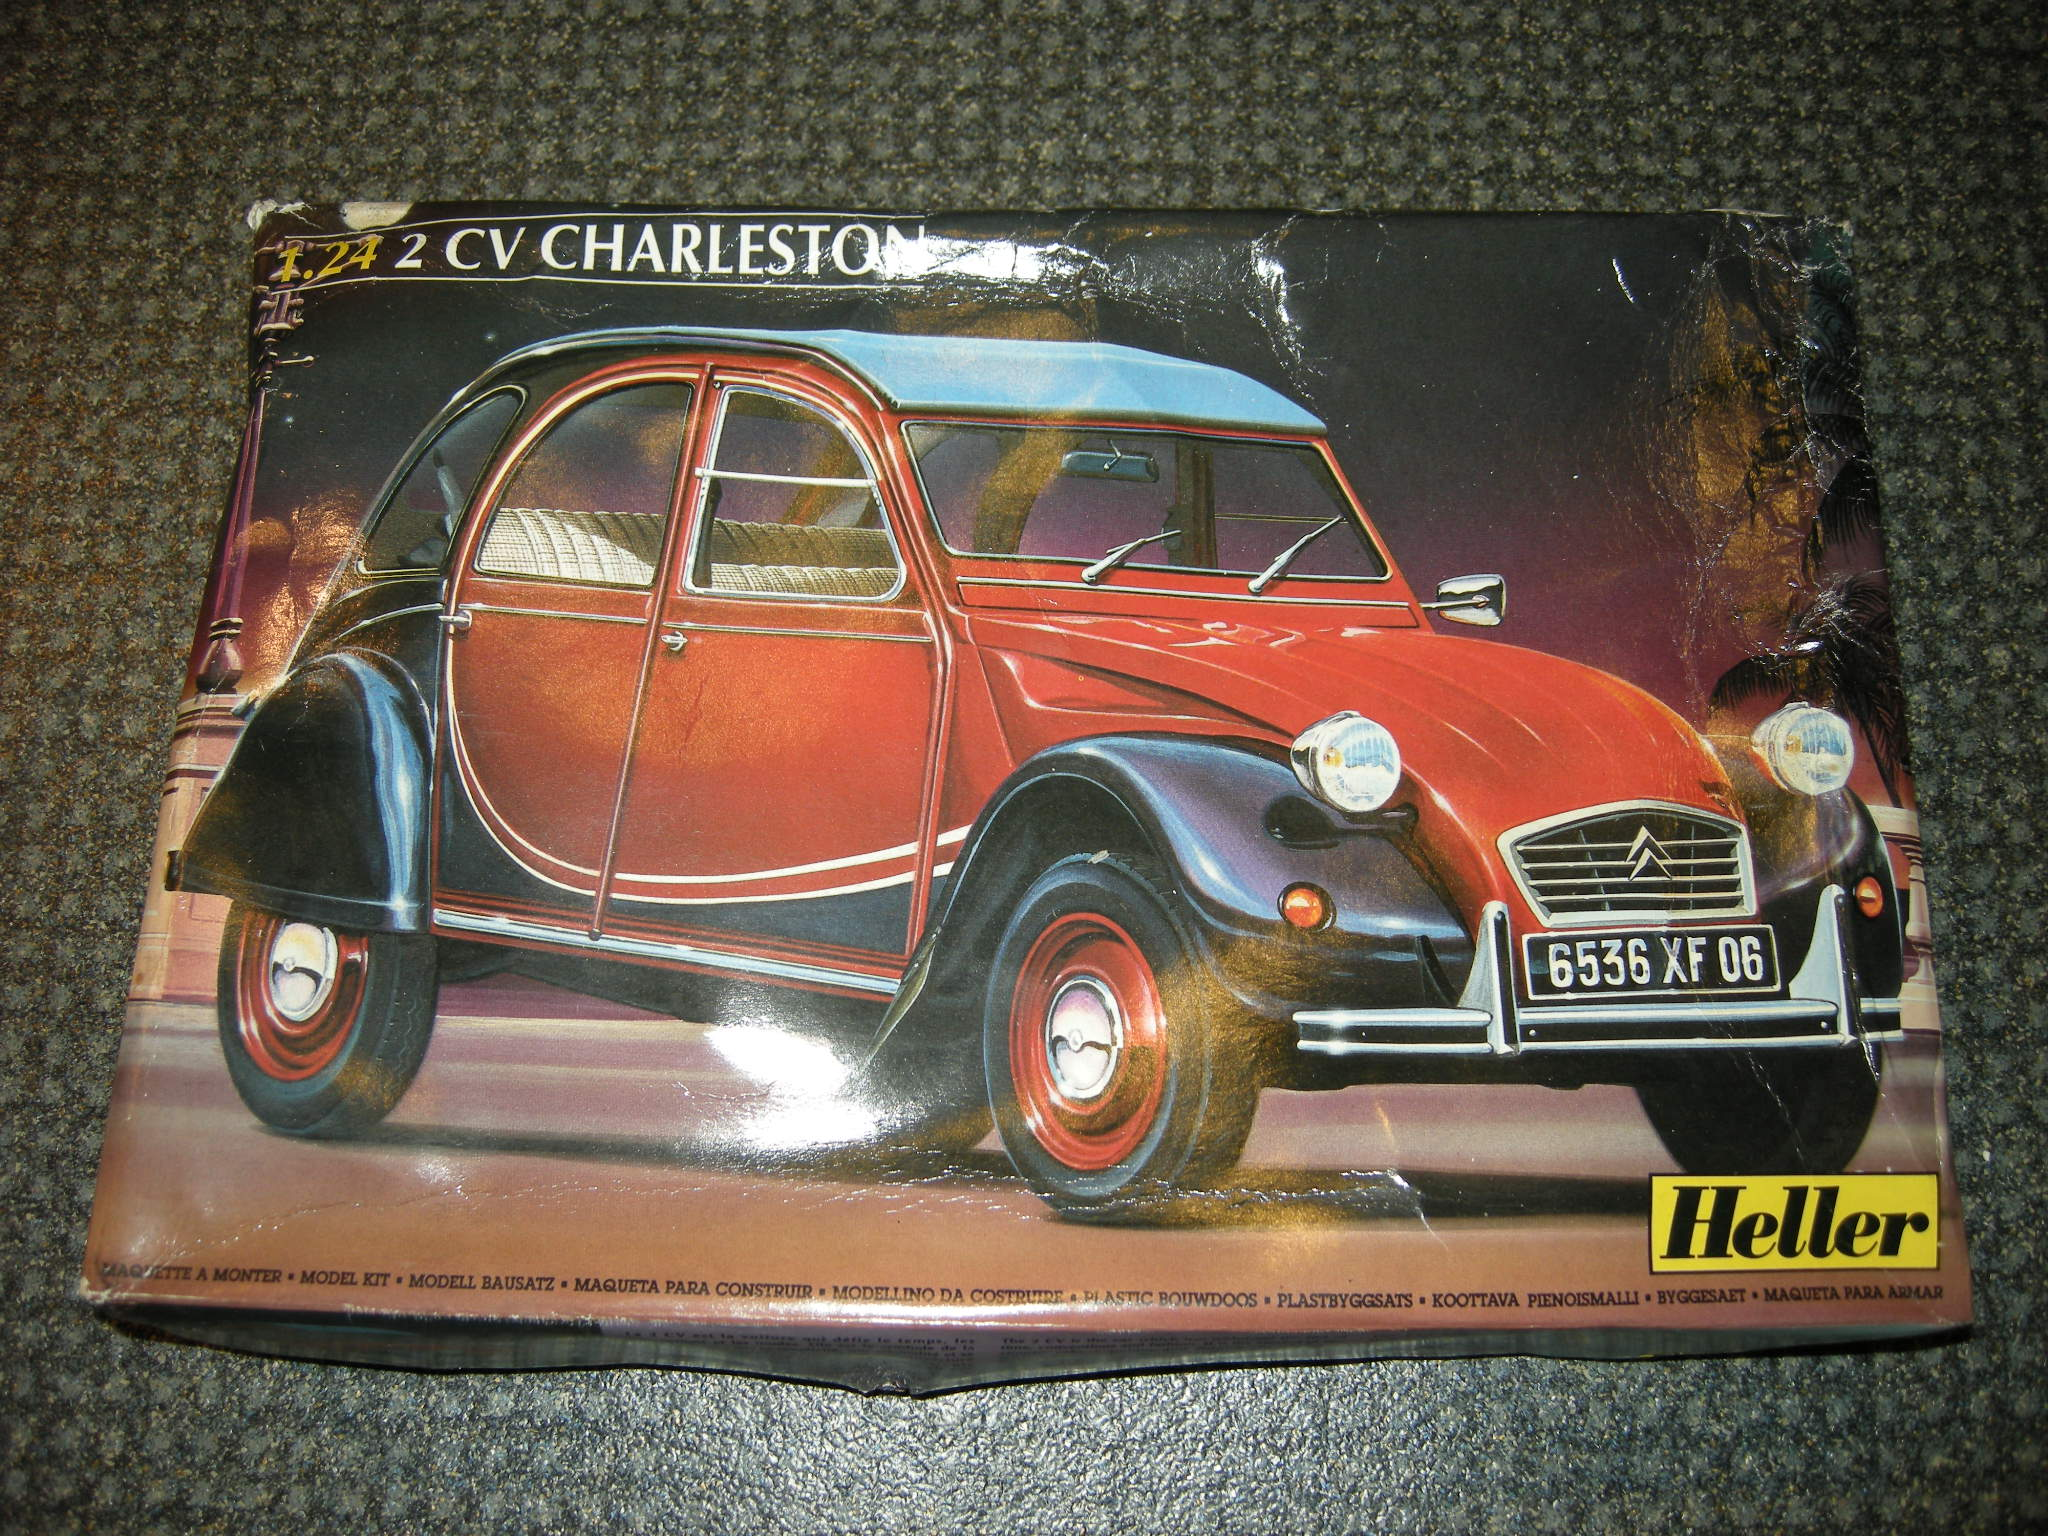 maquette ancienne heller voiture citroen 2cv charleston ref 80765 echelle 1 24 ebay. Black Bedroom Furniture Sets. Home Design Ideas